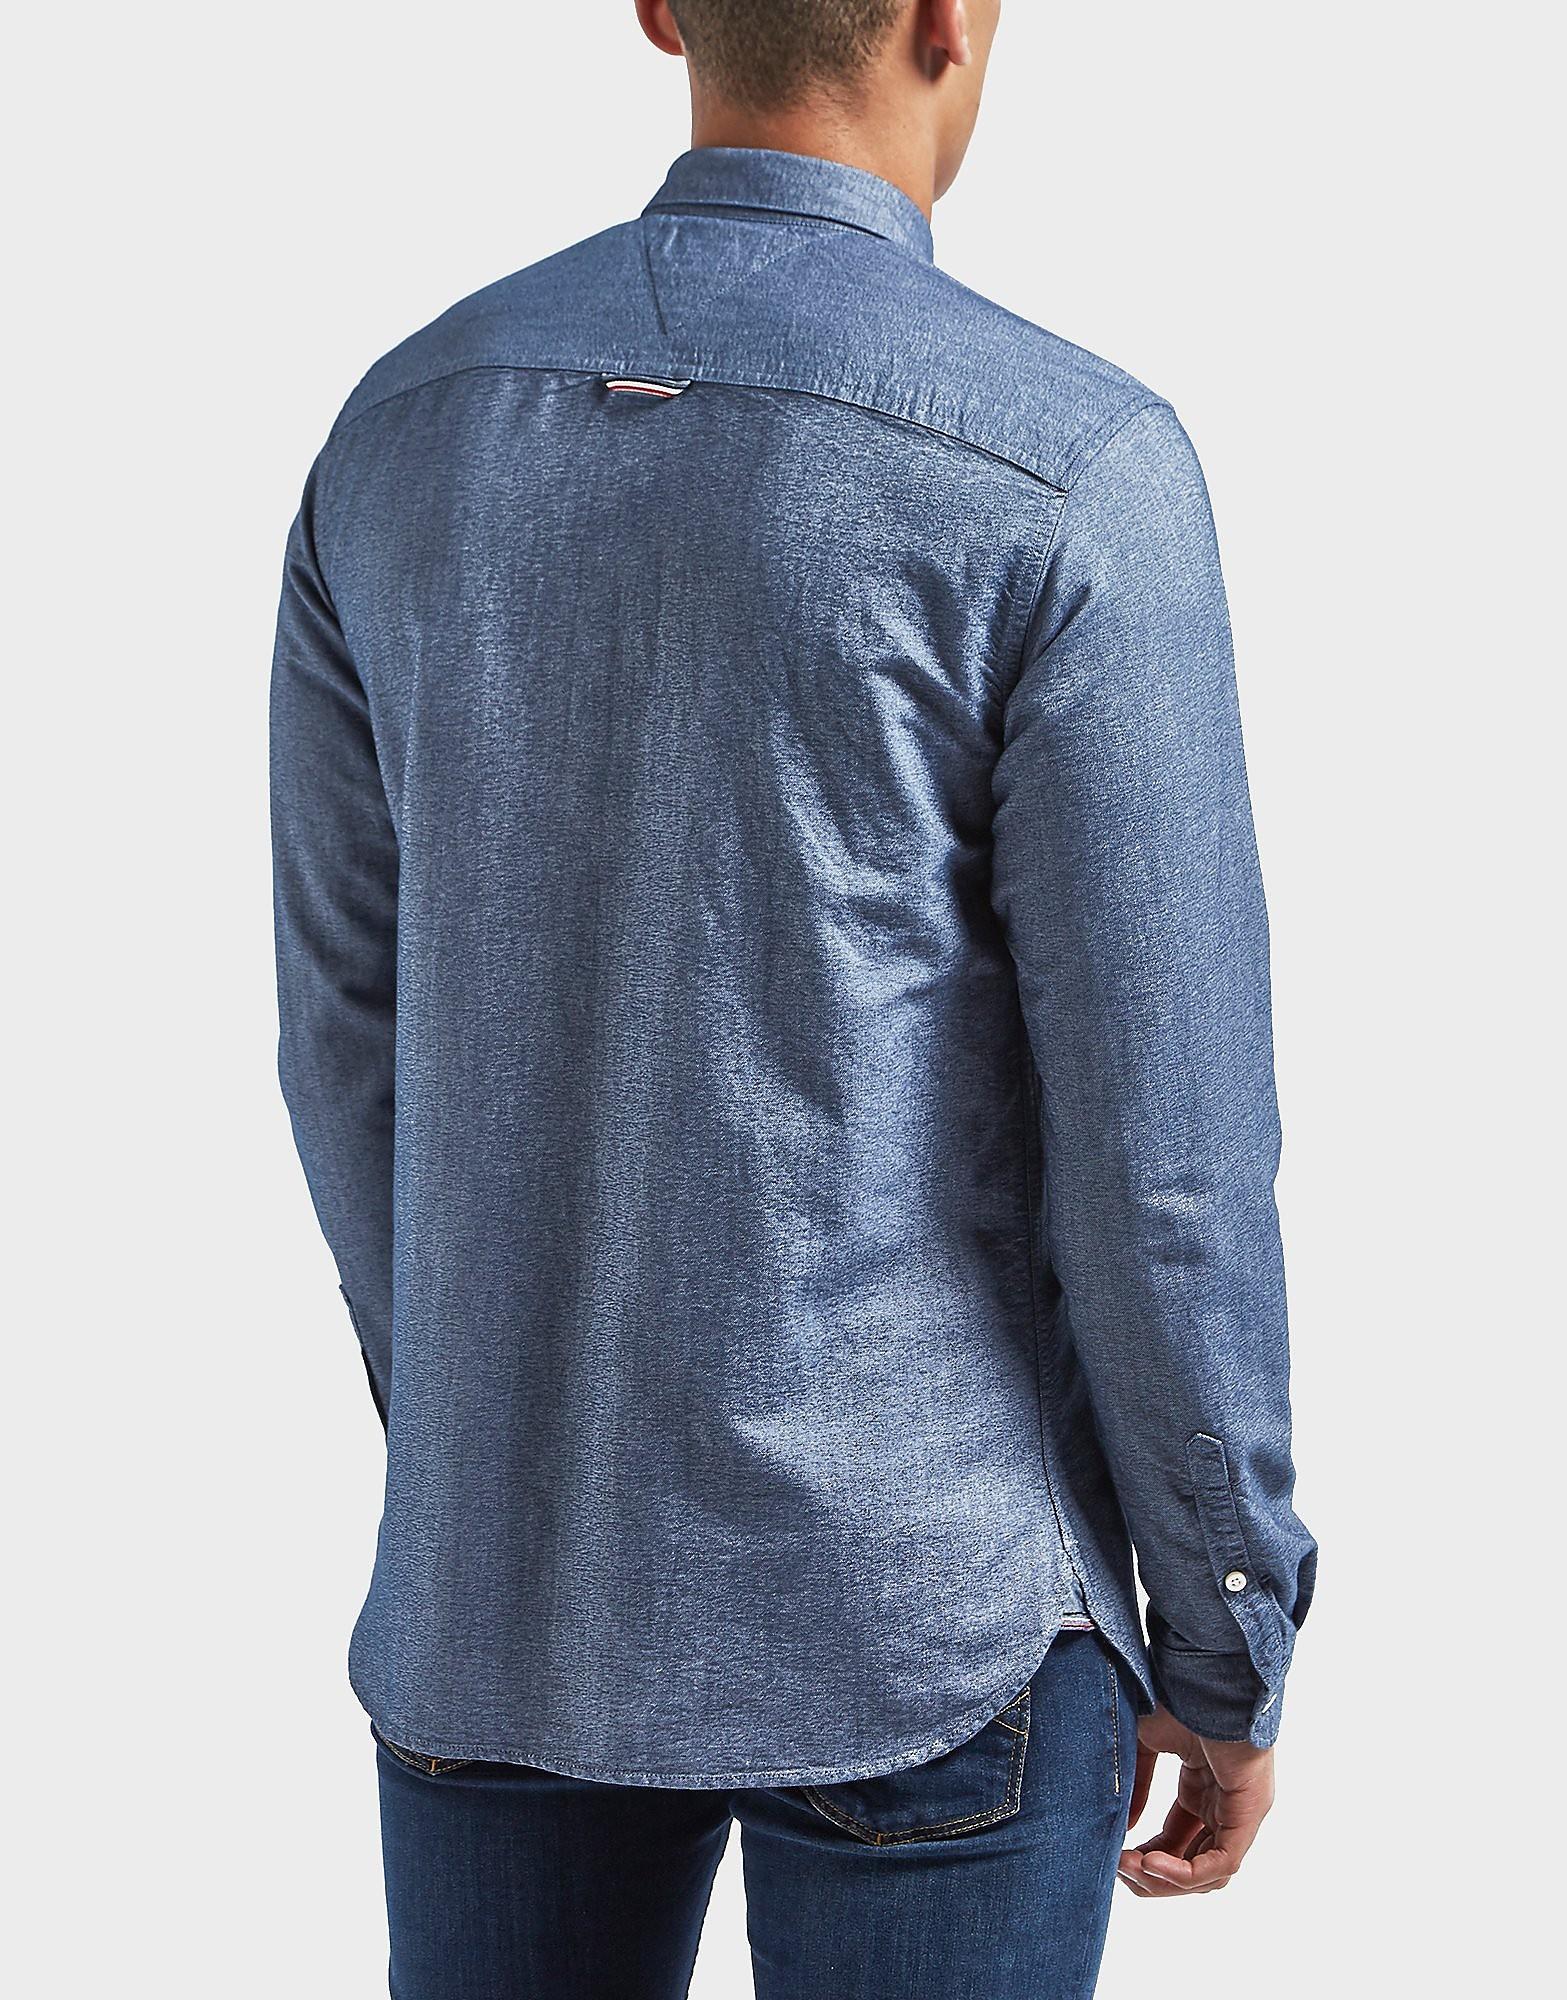 Tommy Hilfiger Basic Long Sleeve Shirt